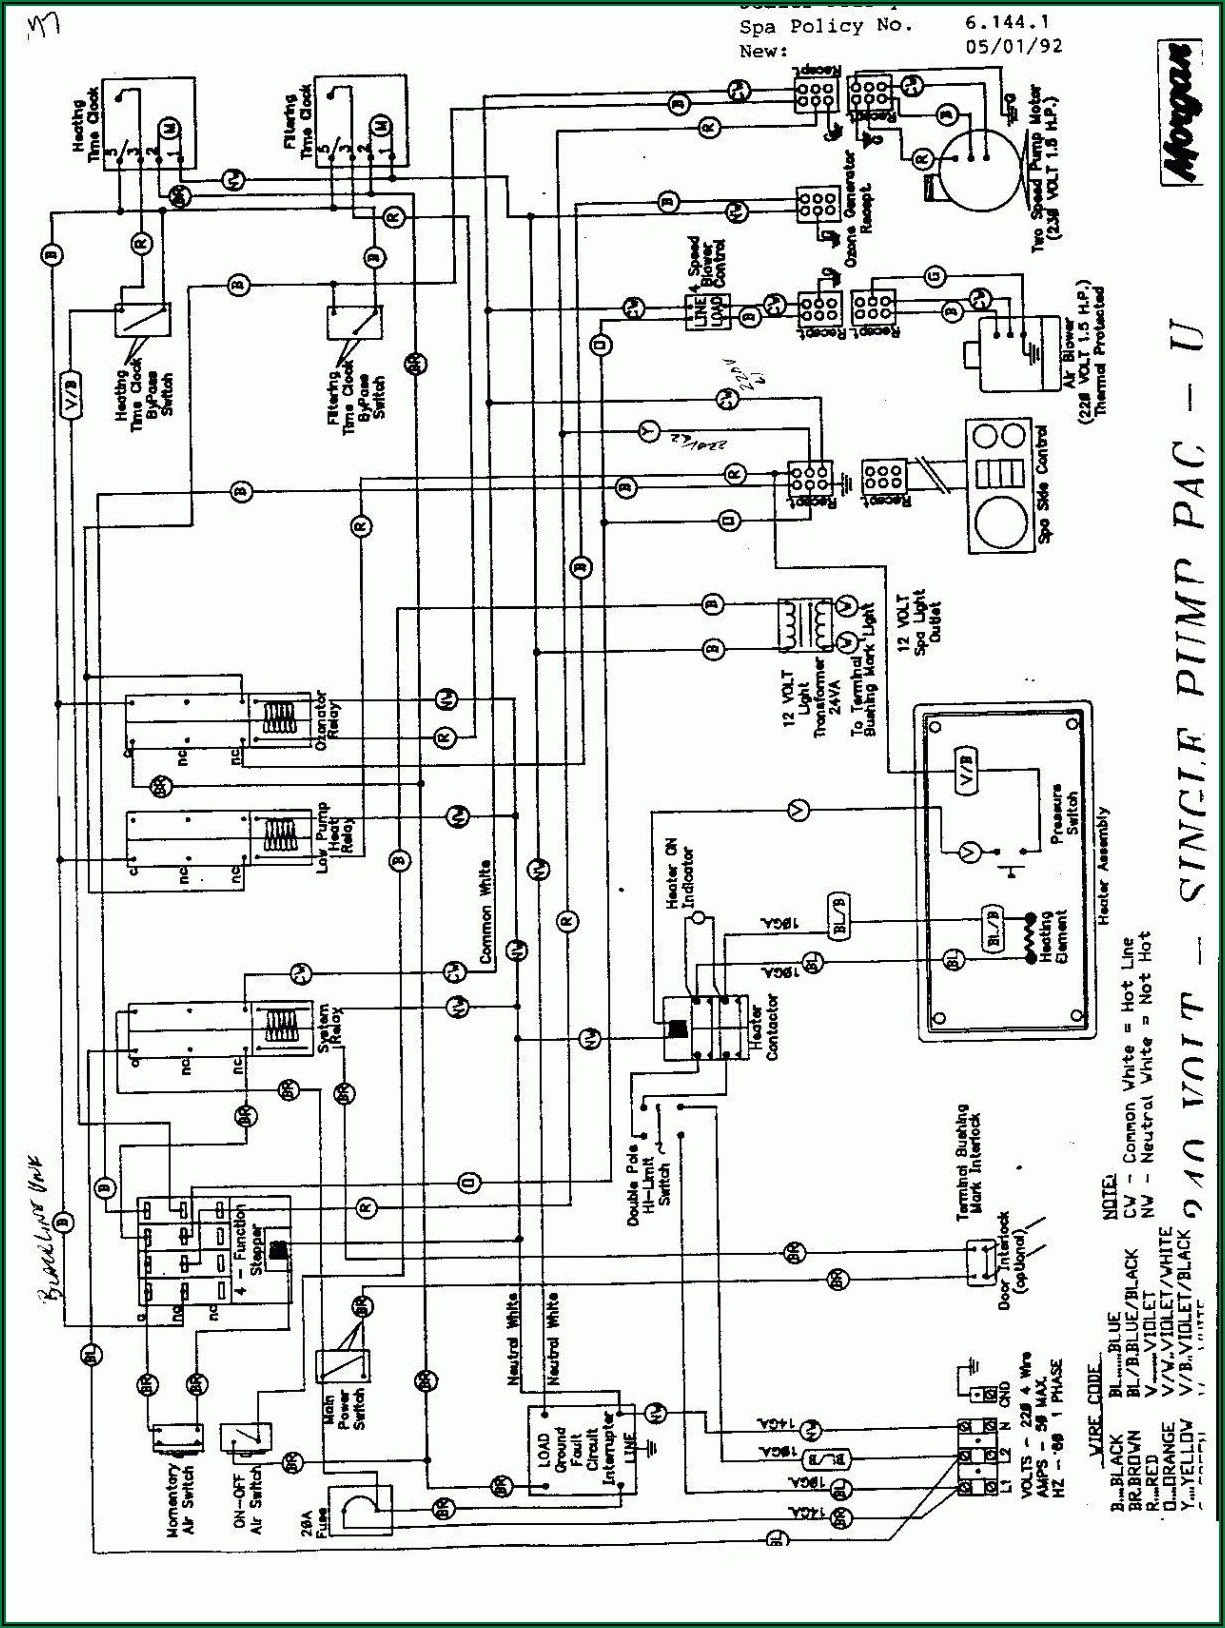 220 Volt Hot Tub Wiring Diagram